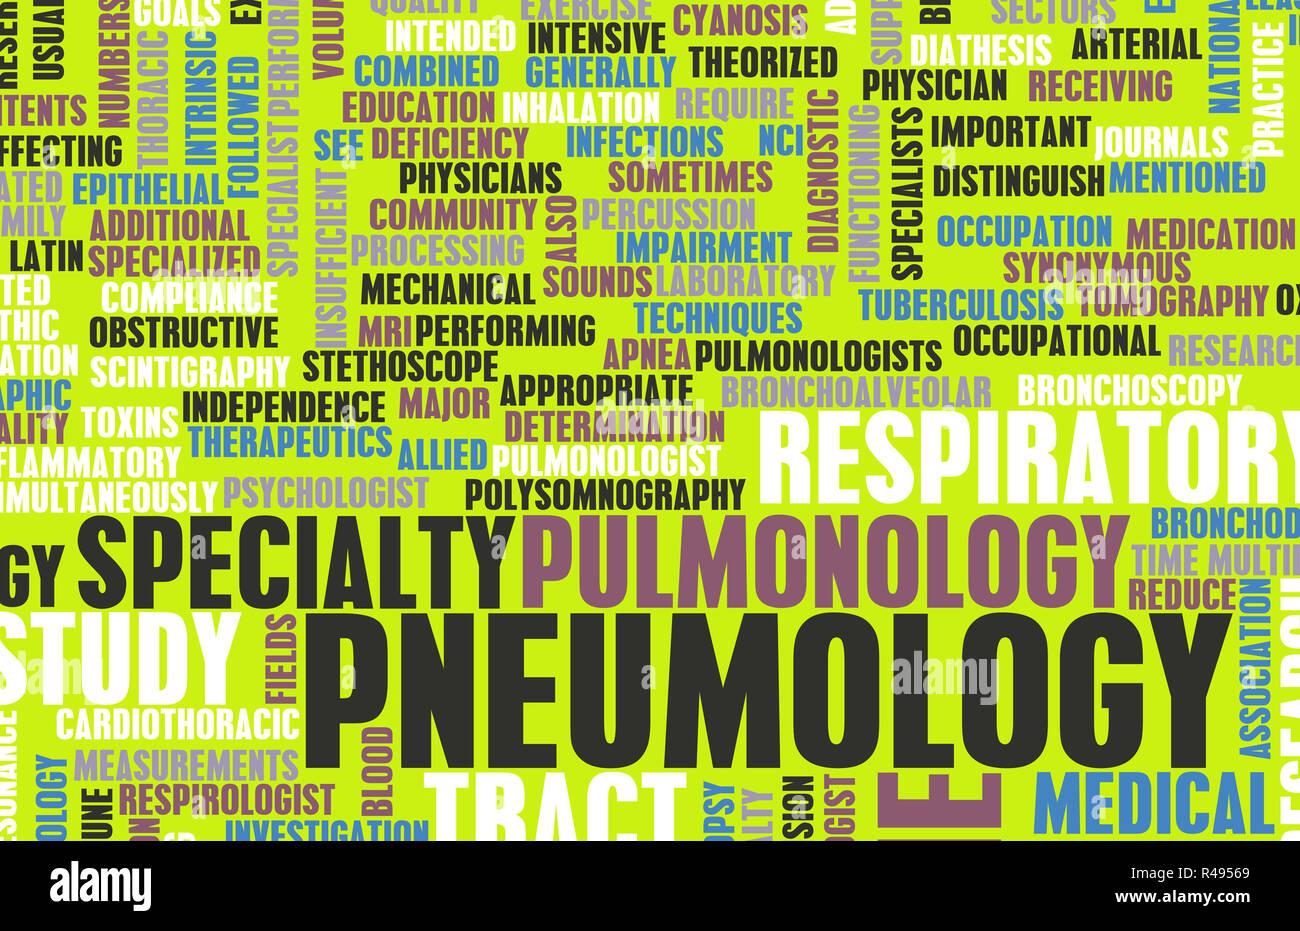 Pneumology - Stock Image